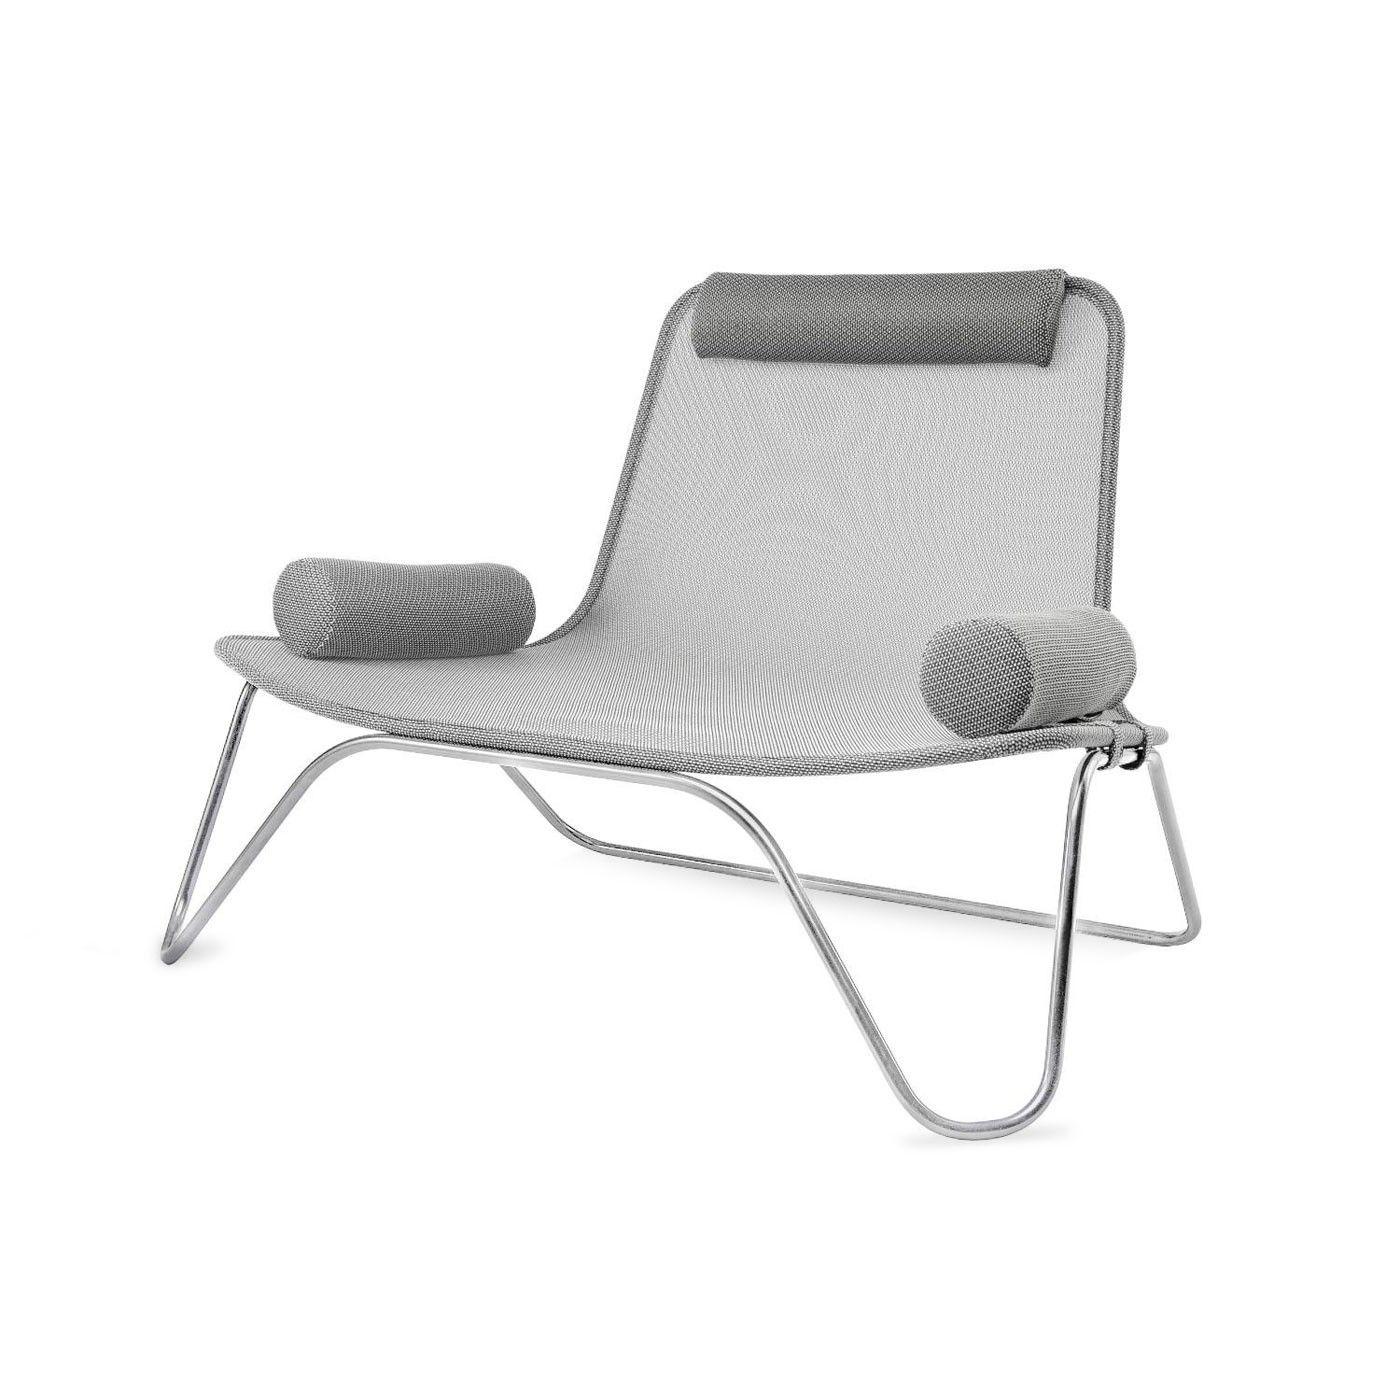 rapson lounge chair - by ralph rapson : winner of the 2007 blu dot